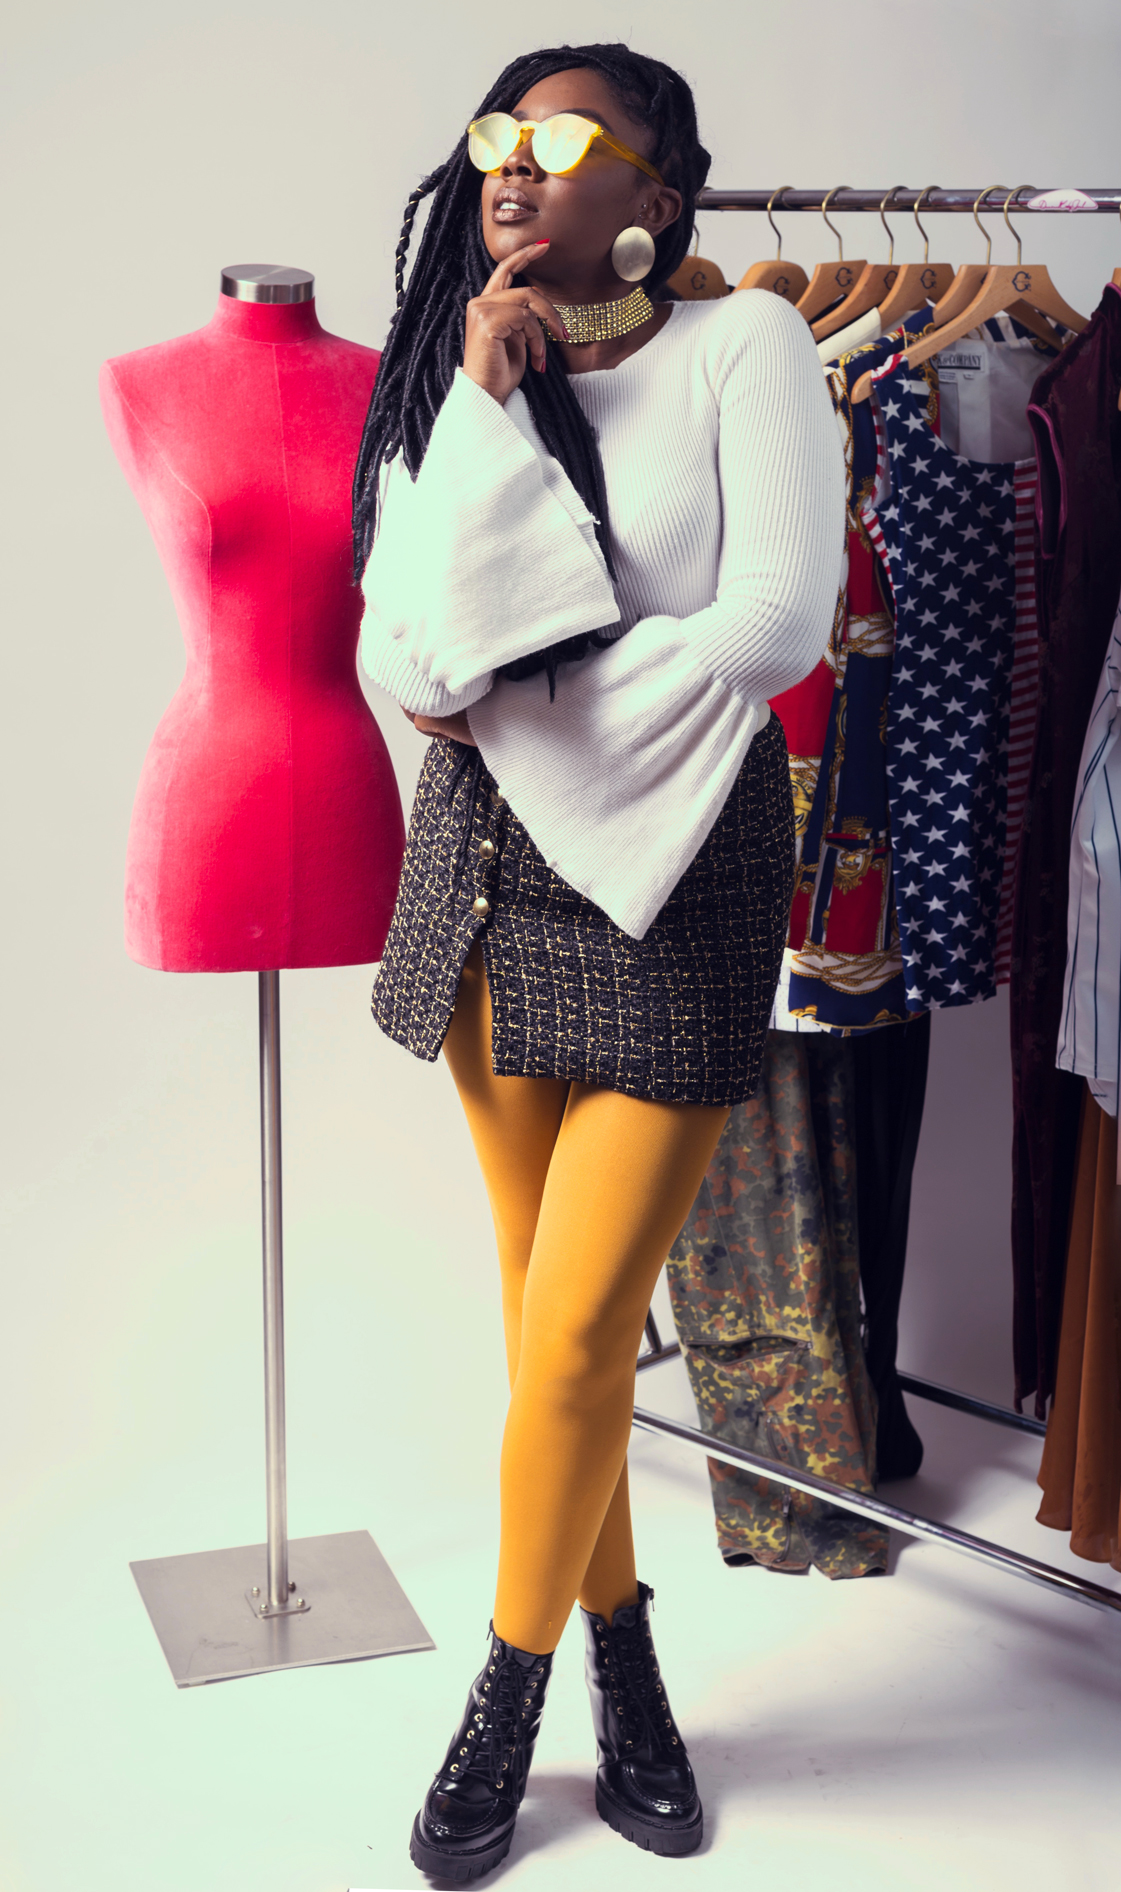 fashionista-photo-shoot-chamber-photography-antoine-hart-2.jpg